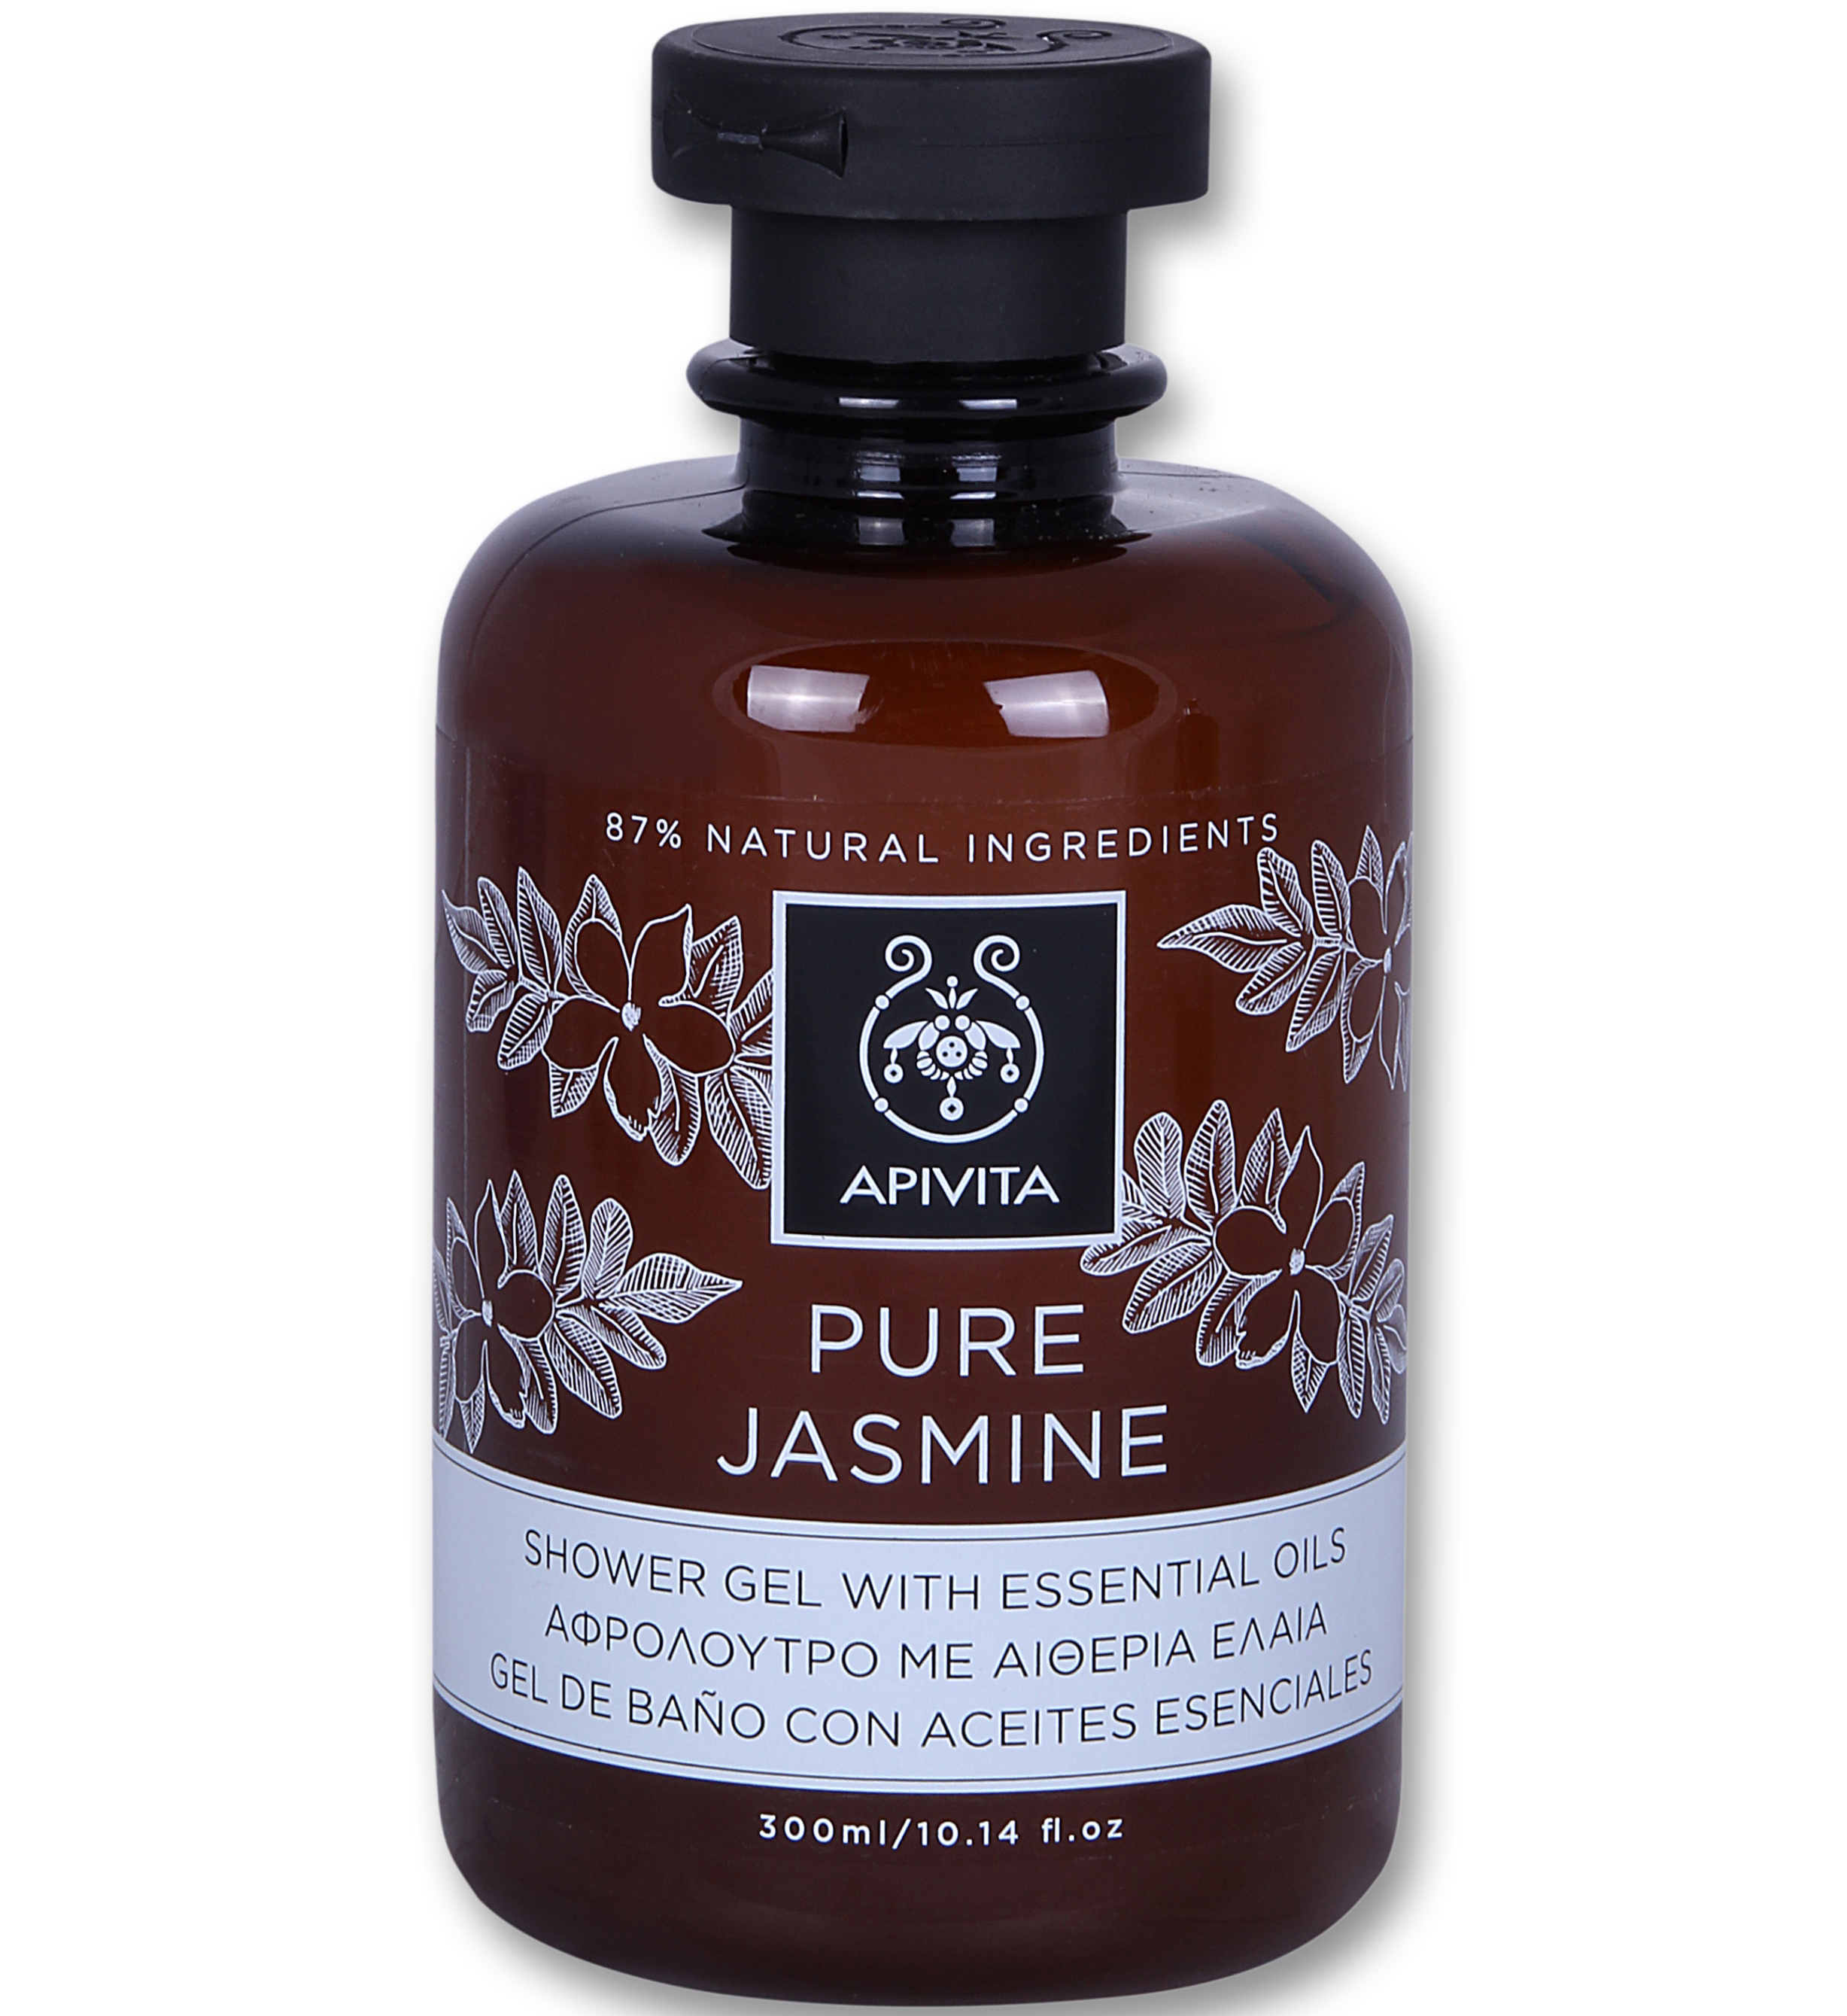 Apivita Pure Jasmine Shower Gel with Essential Oils Αφρόλουτρο με Αιθέρια Έλαια & Άρωμα Γιασεμί 300ml